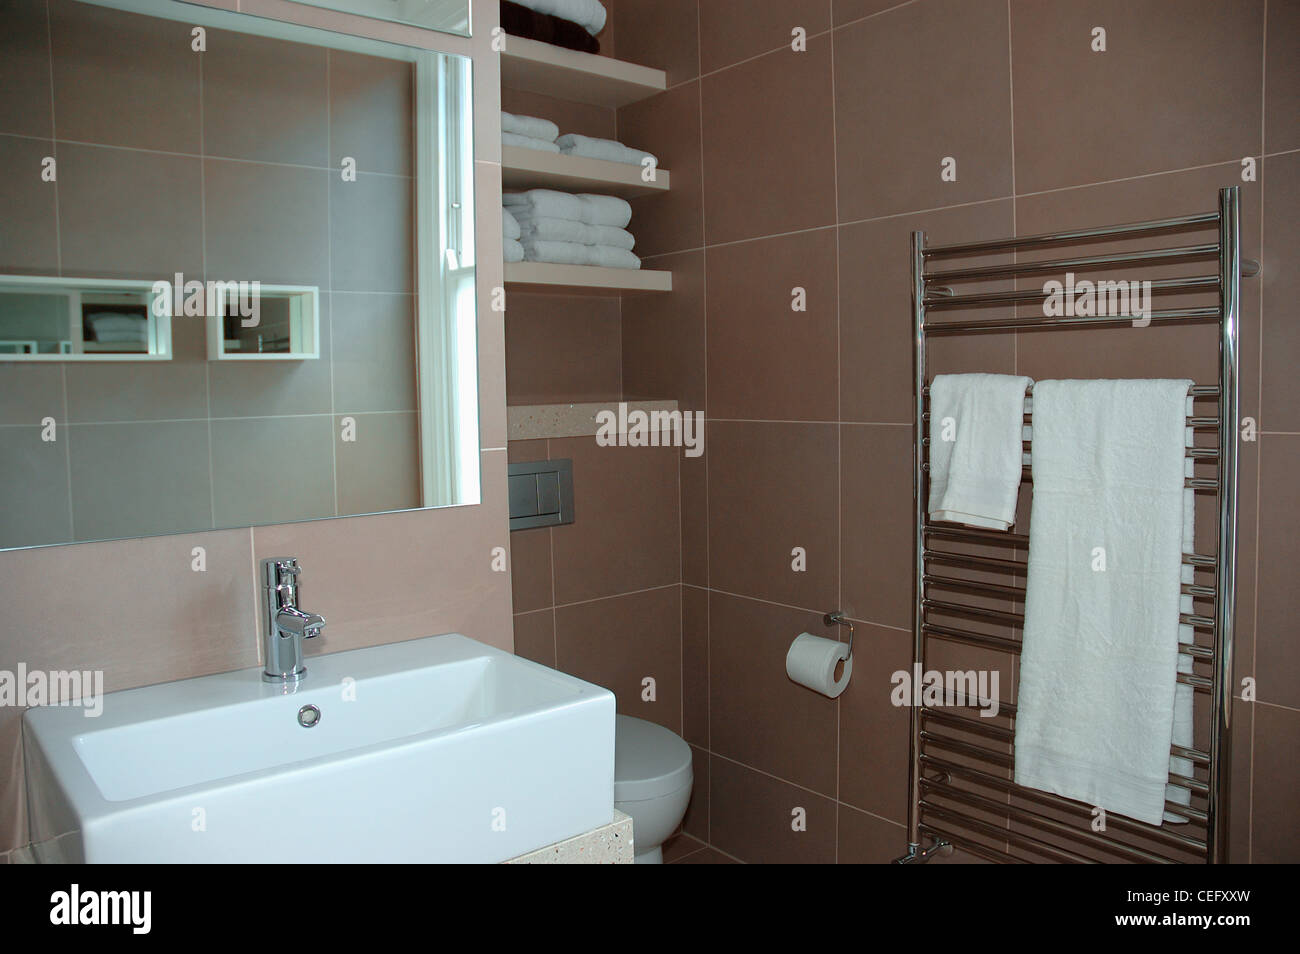 ee8842789aae5 Large mirror above rectangular white basin in modern brown bathroom ...